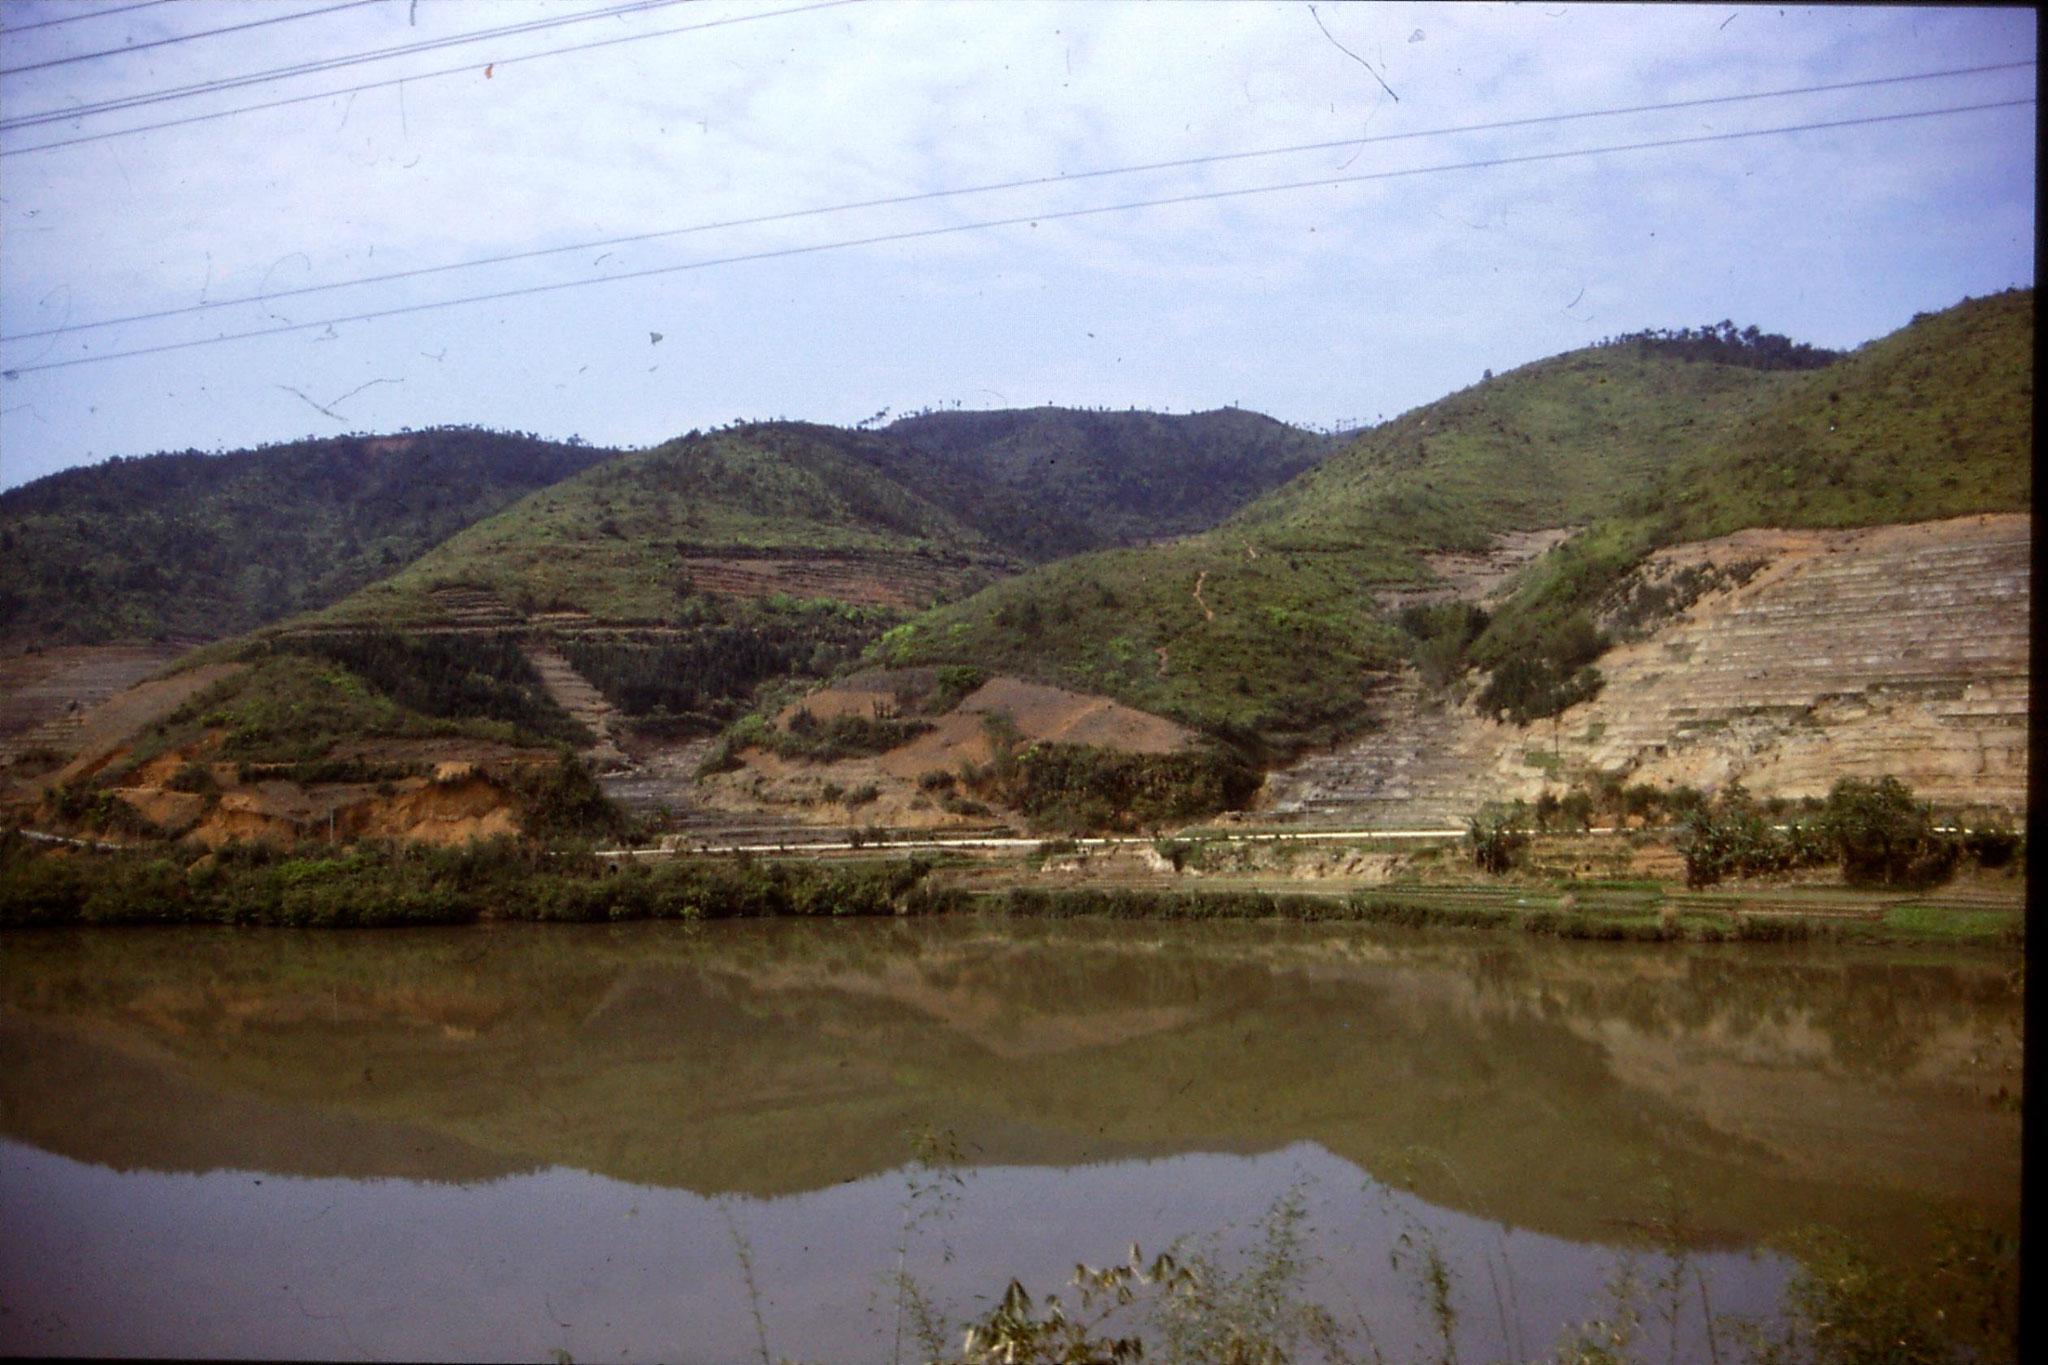 29/3/1989: 10: Fujian